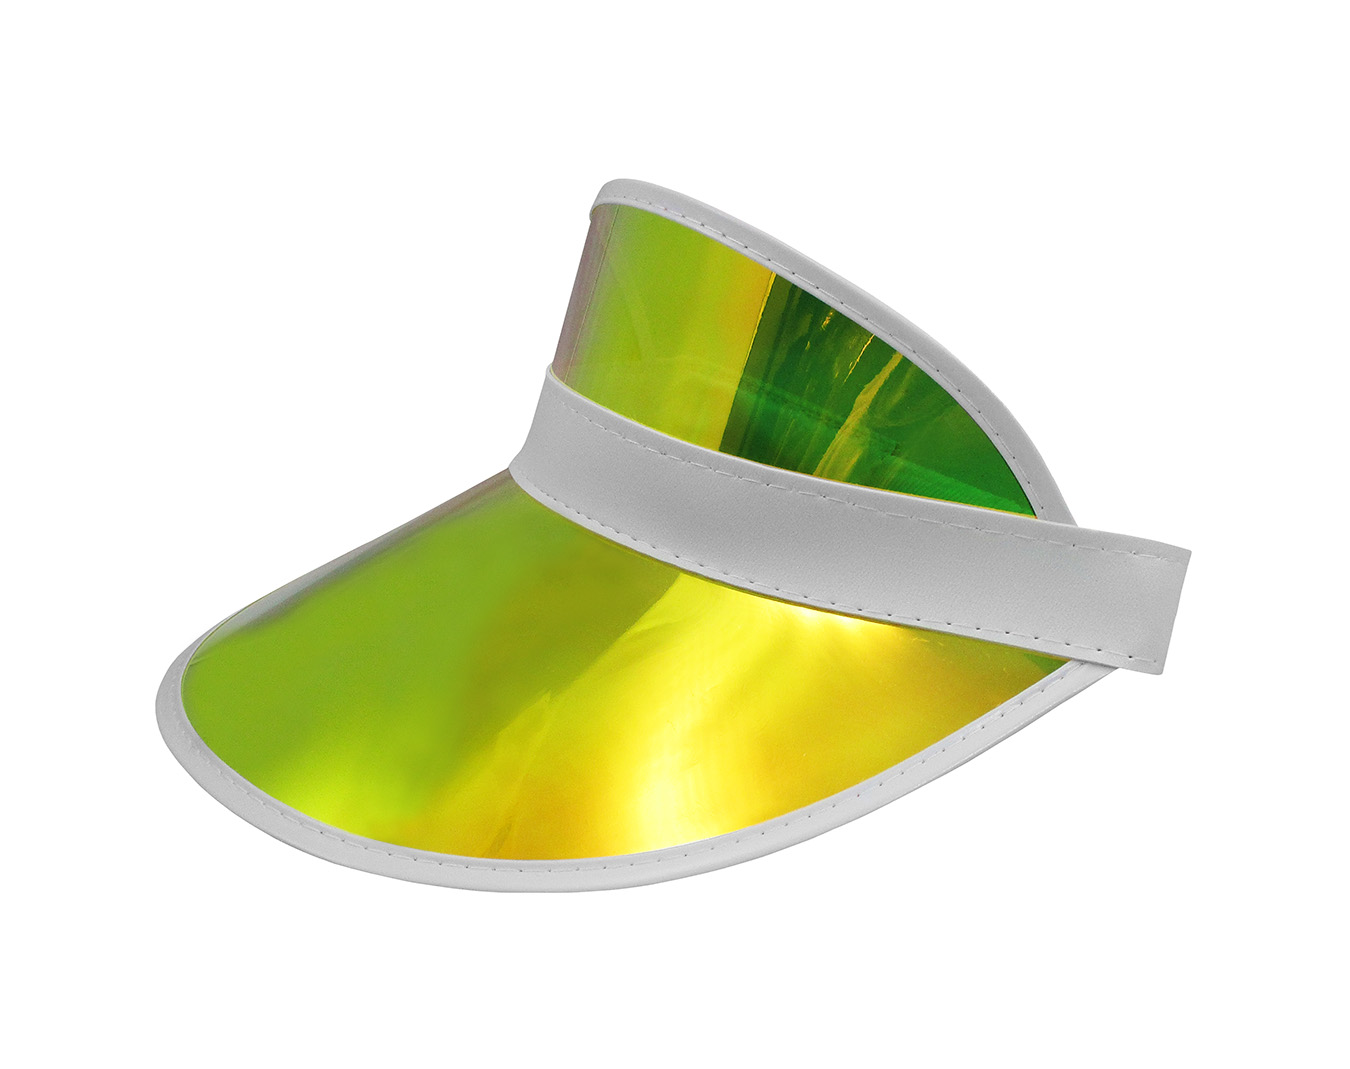 thumbnail 4 - Tennis-Beach-Iridescent-Mirrored-Plastic-Sun-Vegas-Golf-Casino-Visor-Hat-Qty-3